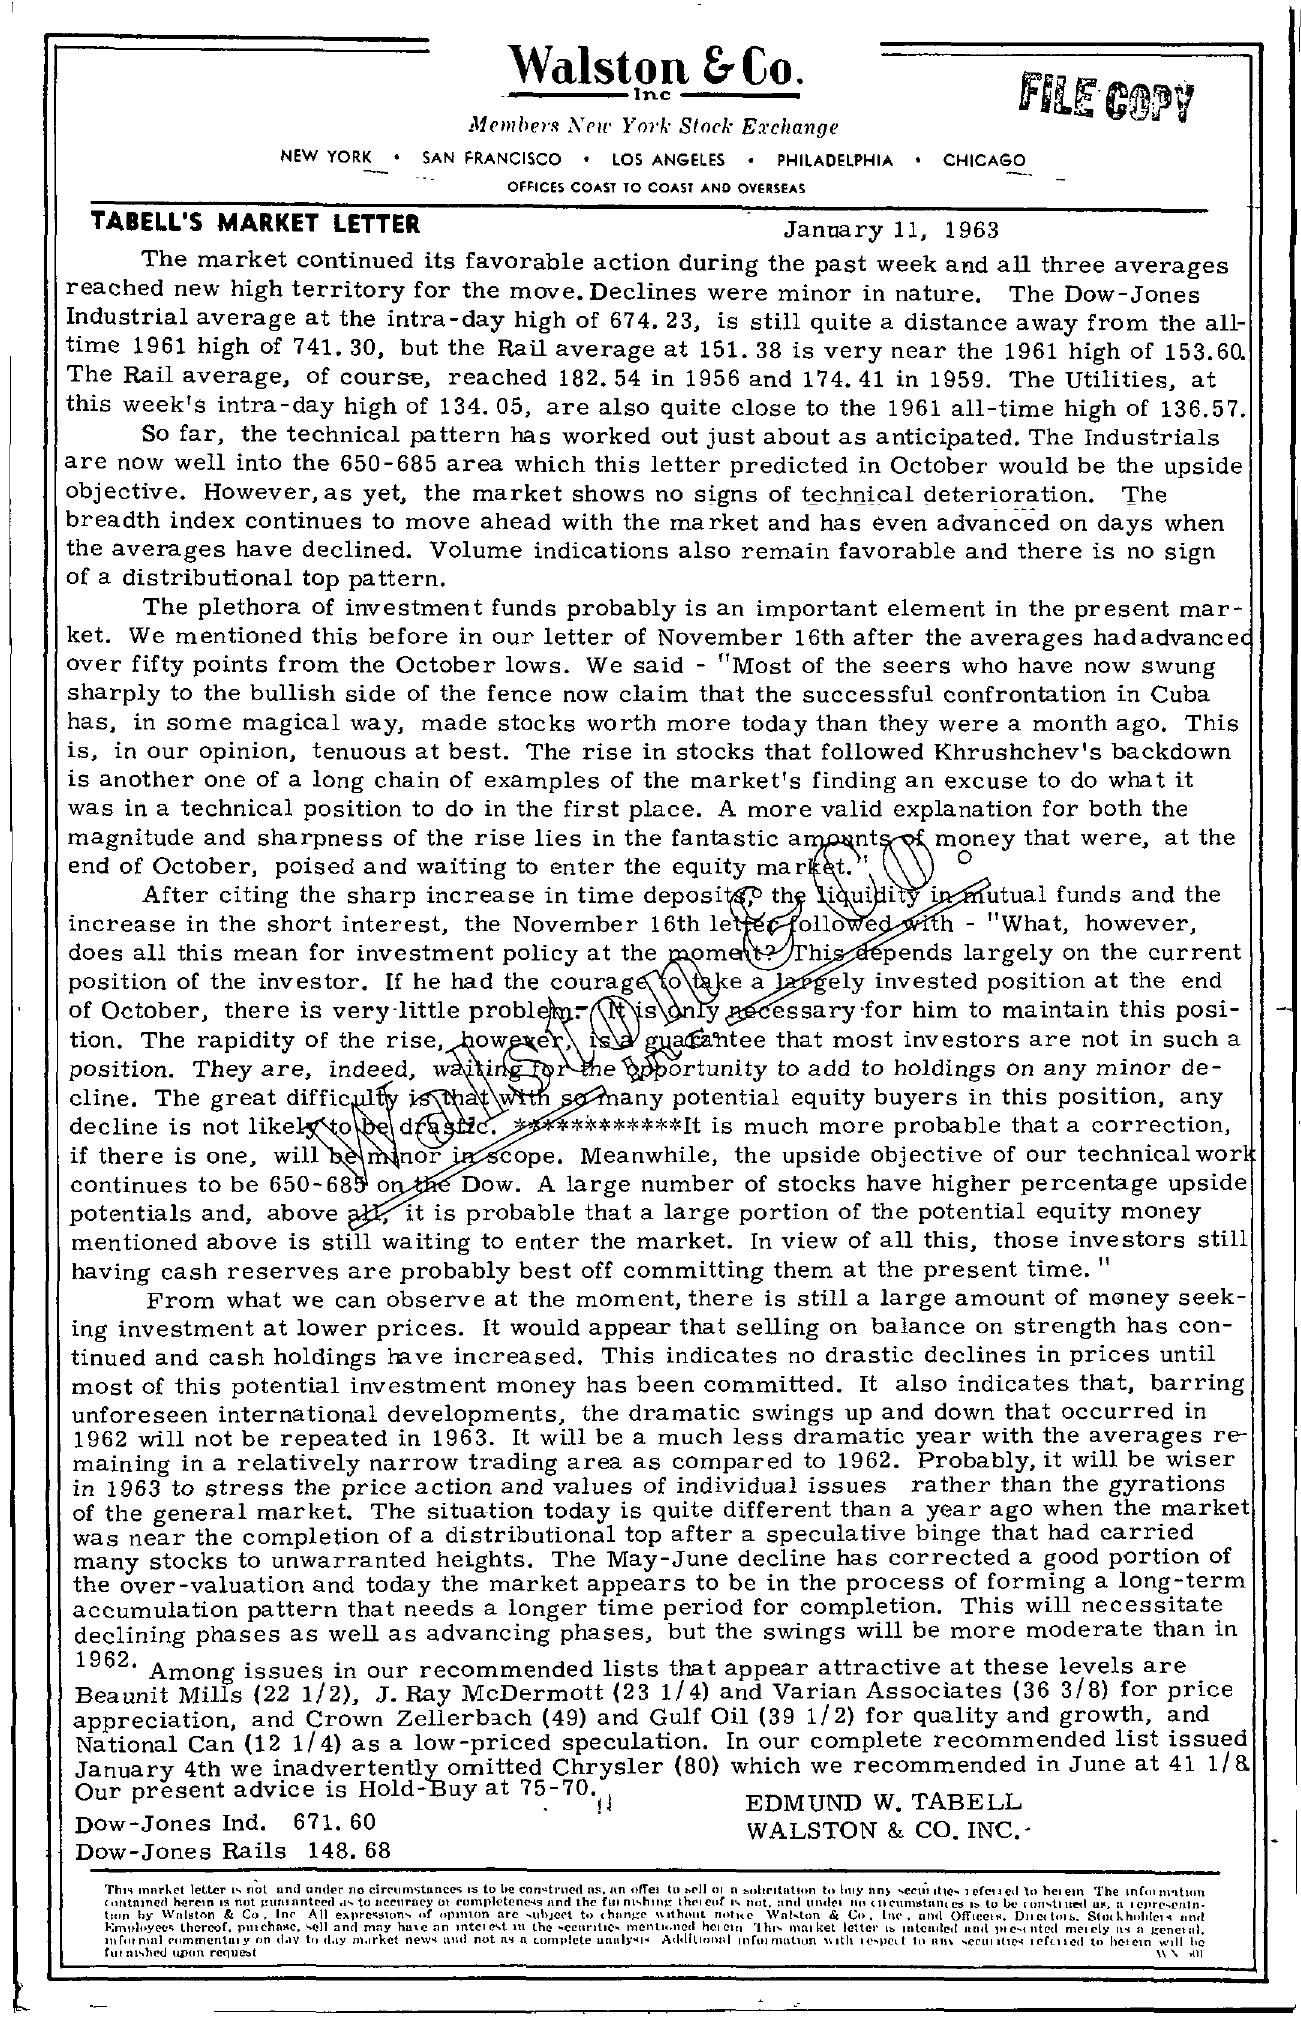 Tabell's Market Letter - January 11, 1963